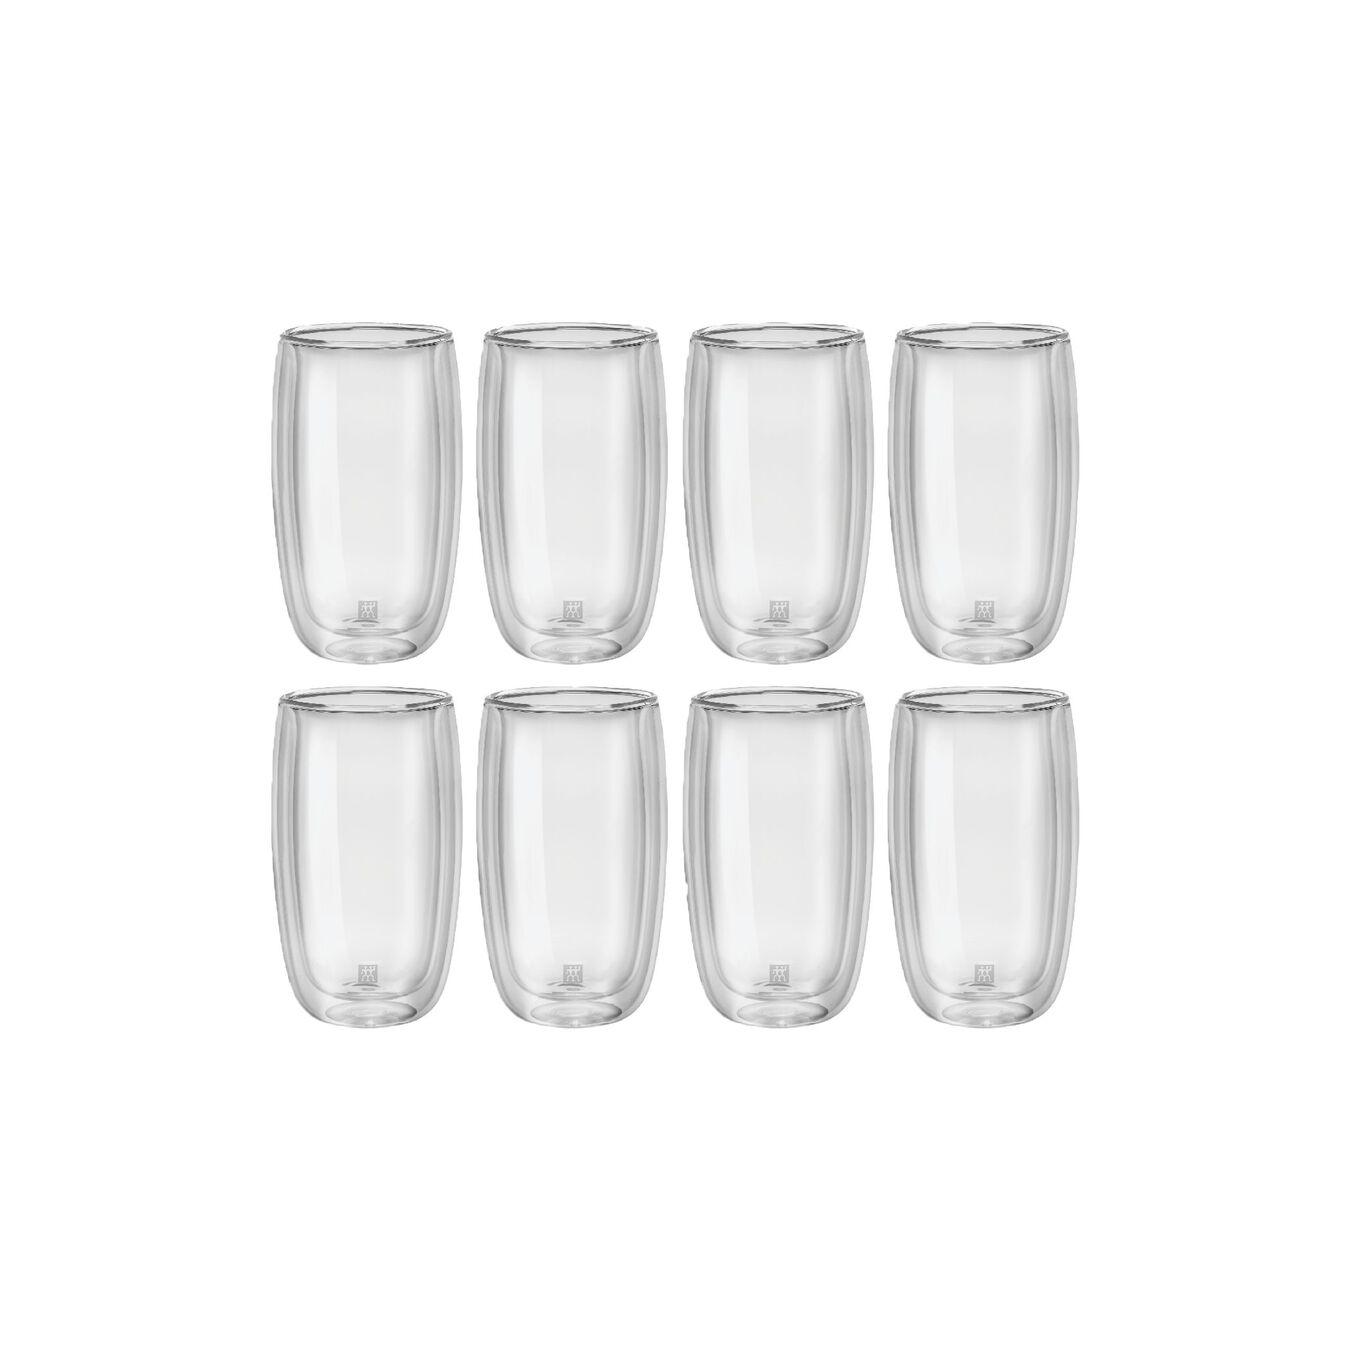 8 Piece Latte Glass Set - Value Pack,,large 2